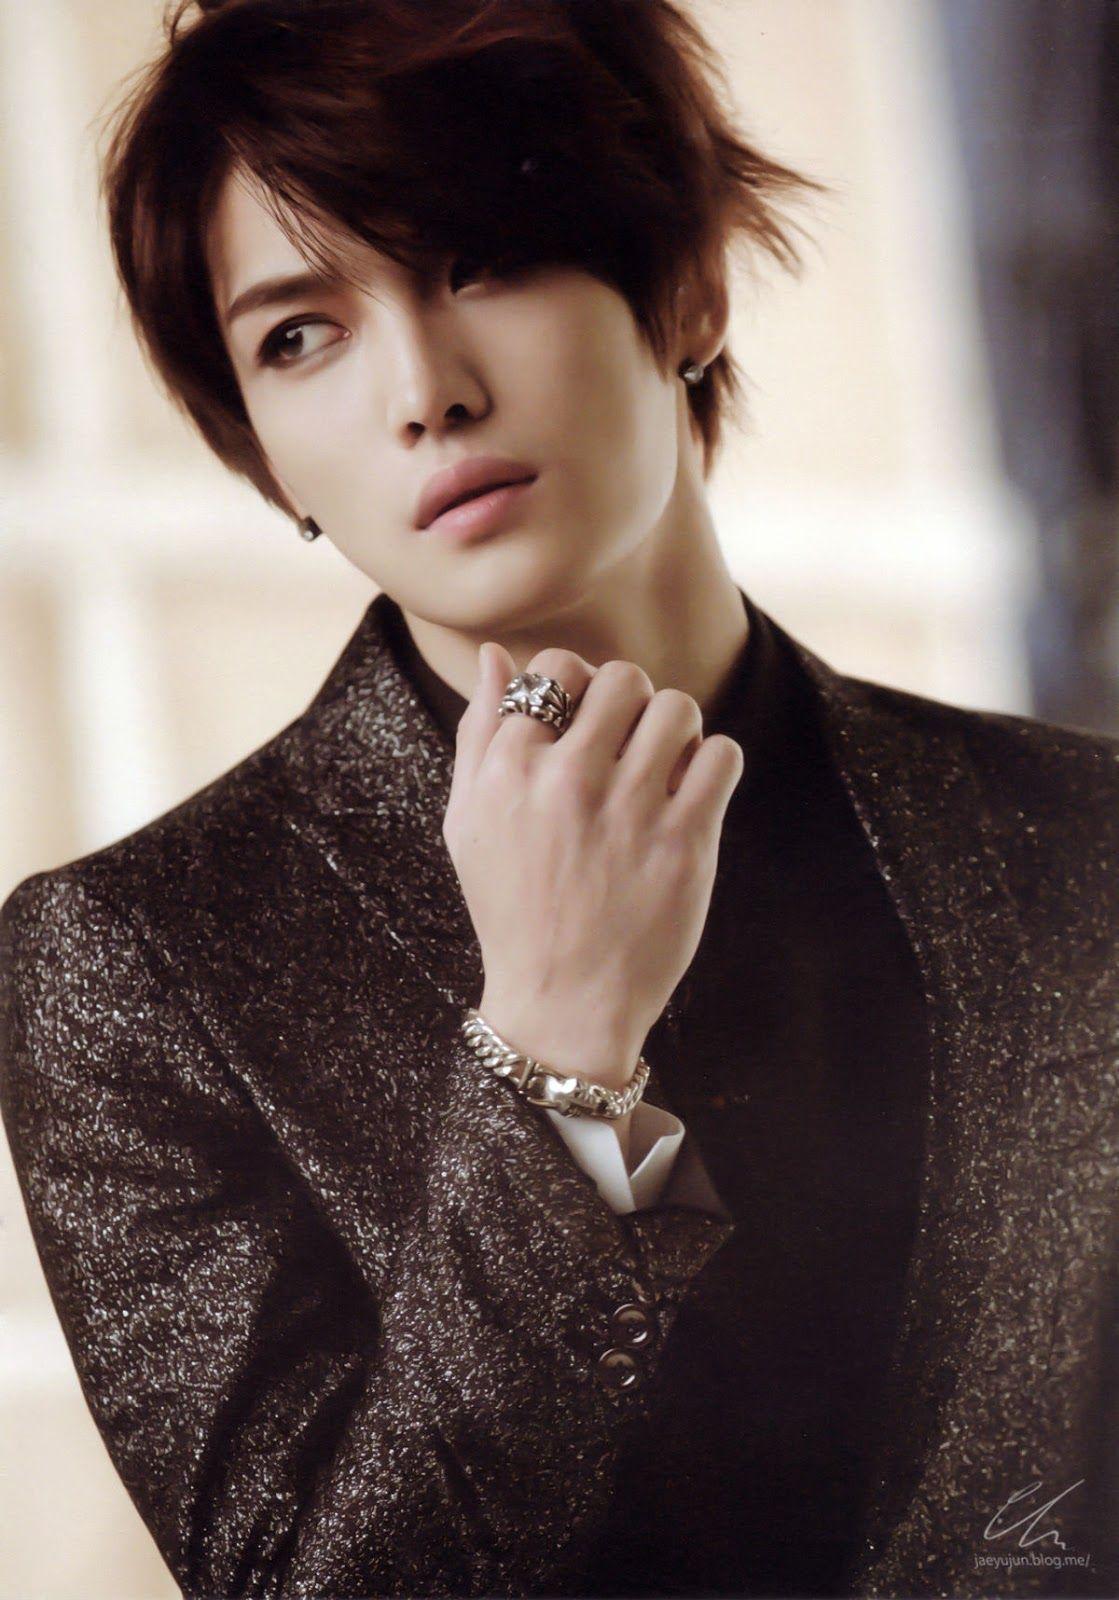 Google theme jaejoong - Jyj S Jaejoong S Mini Album Y Photobook Photos Latest K Pop